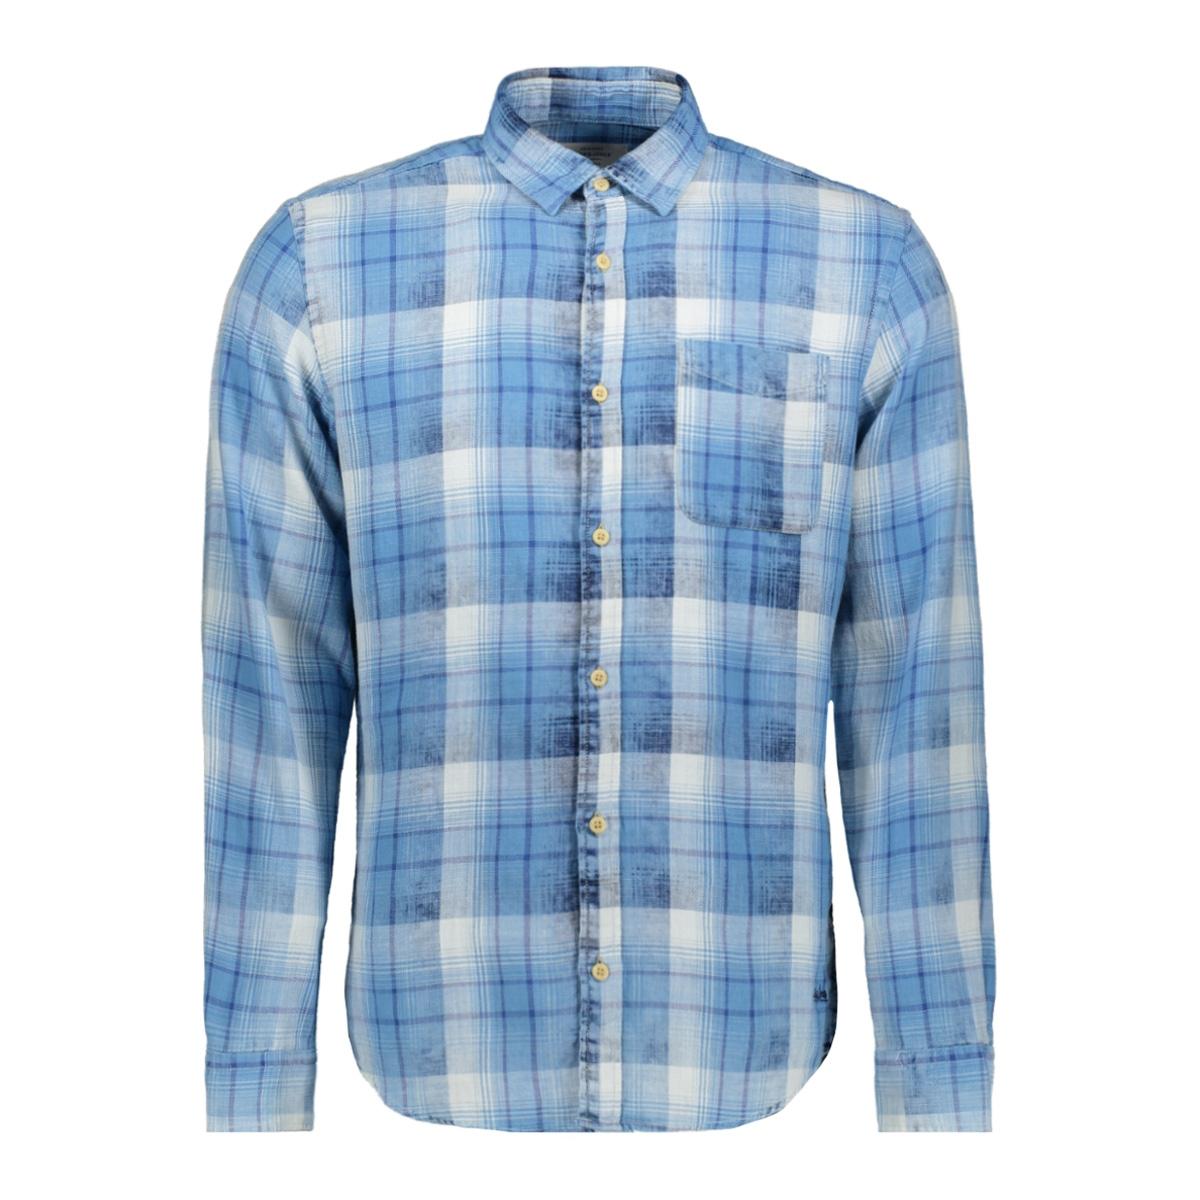 442e6167a4 jorknox shirt ls 12147525 jack   jones overhemd bonnie blue slim